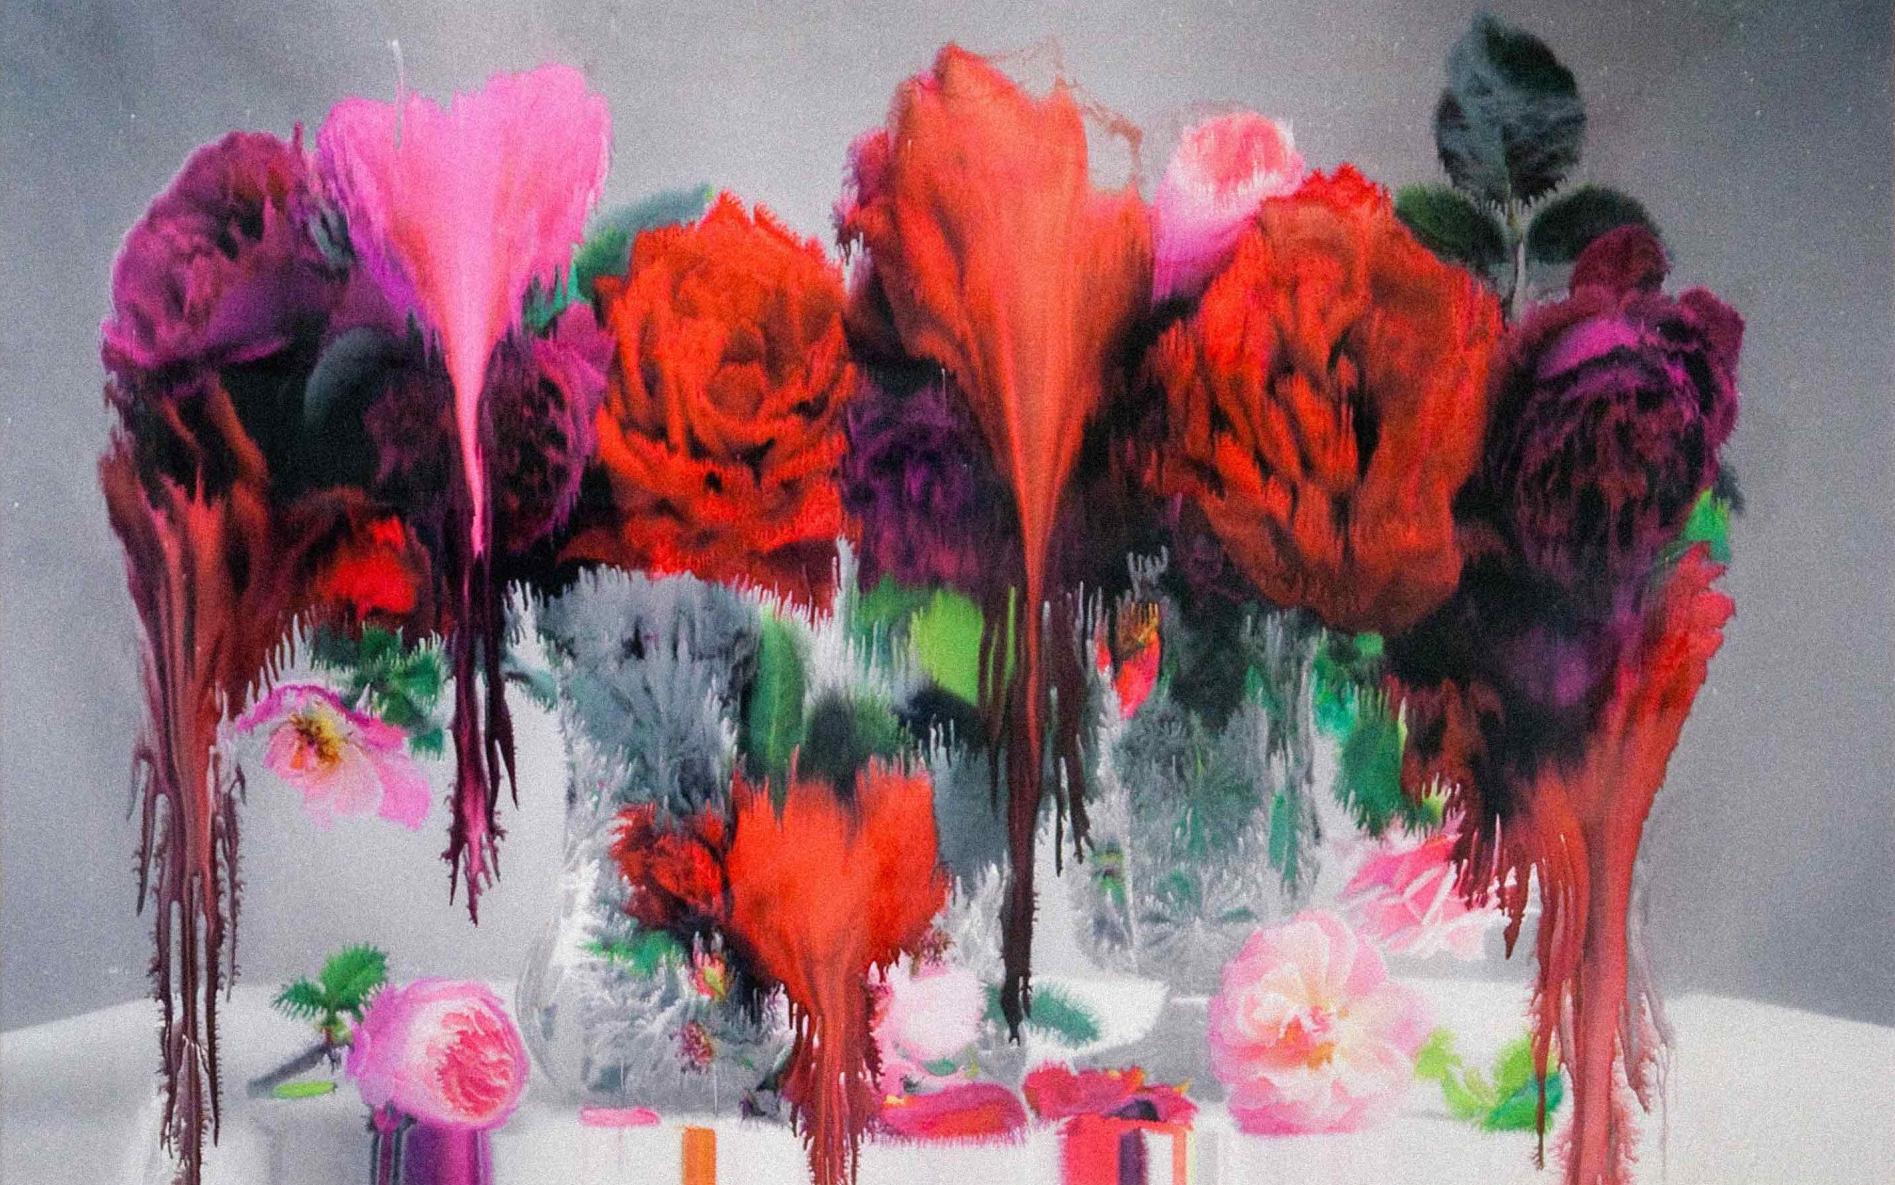 'Roses from My Garden', el particular jardín de Nick Knight